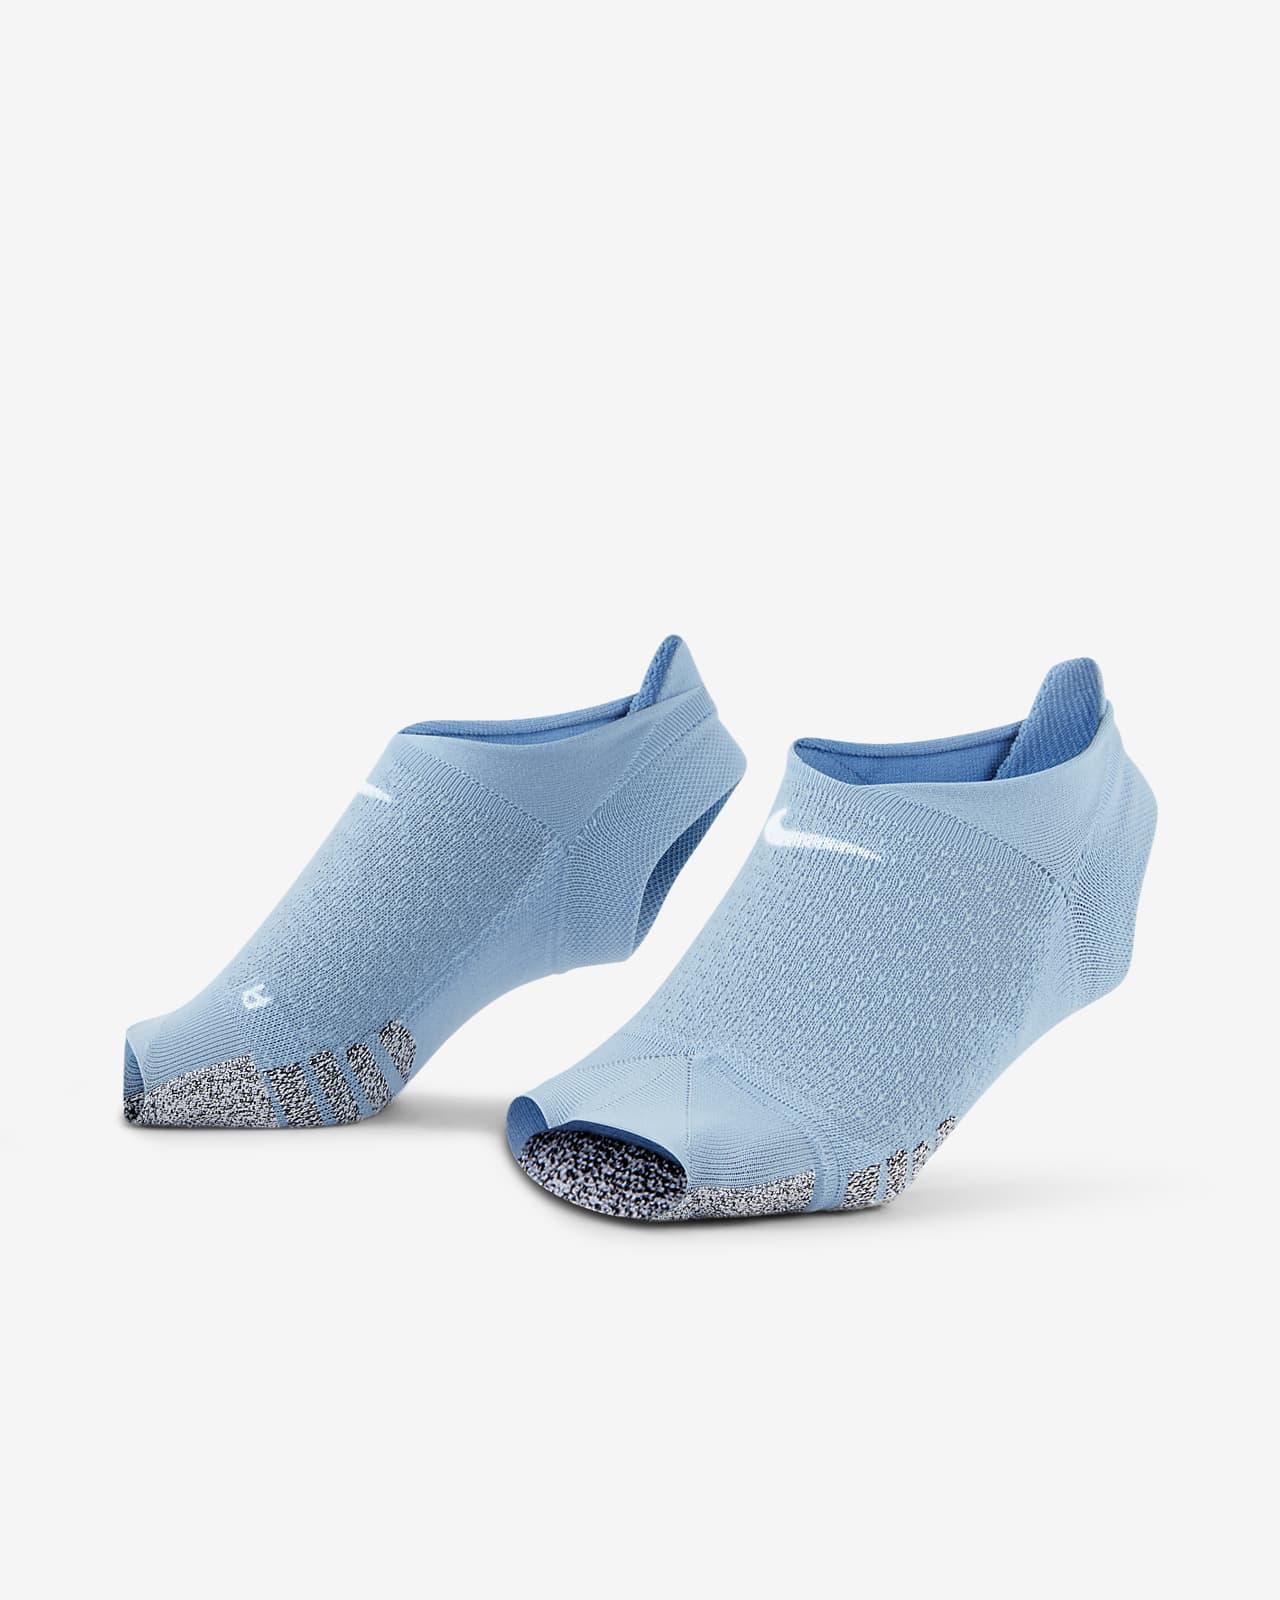 NikeGrip Studio Women's Toeless Footie Socks